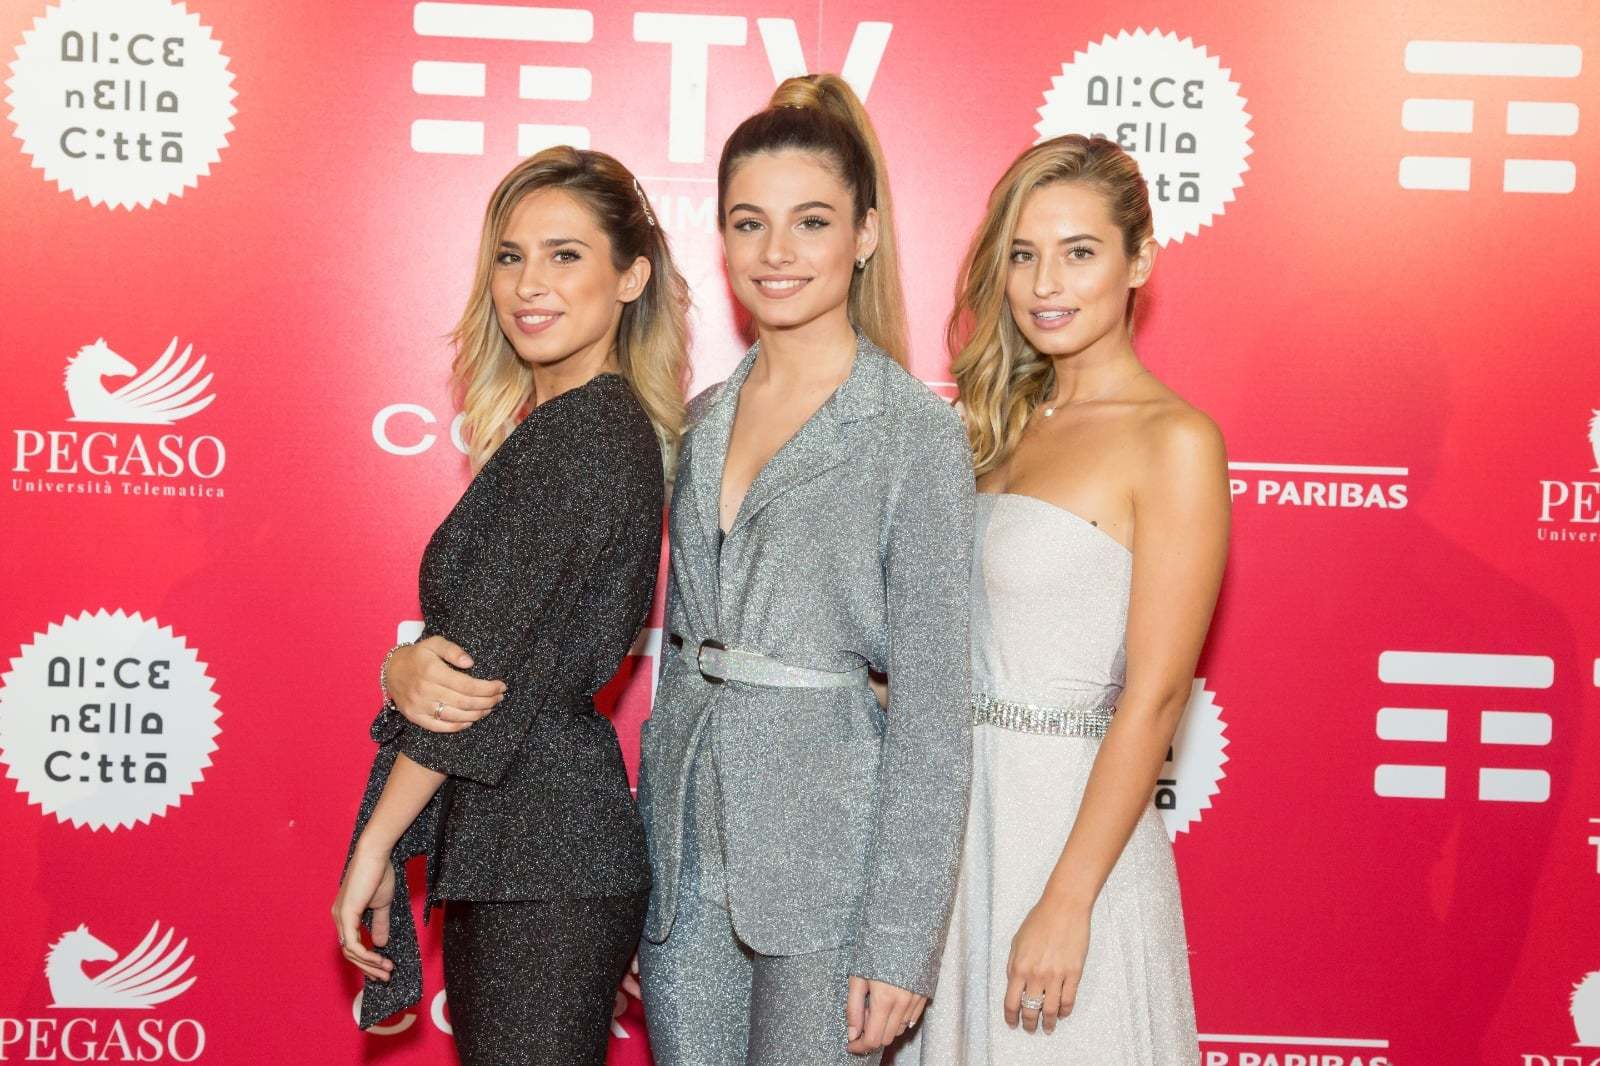 Giovanna, Francesca e Valentina Goglino